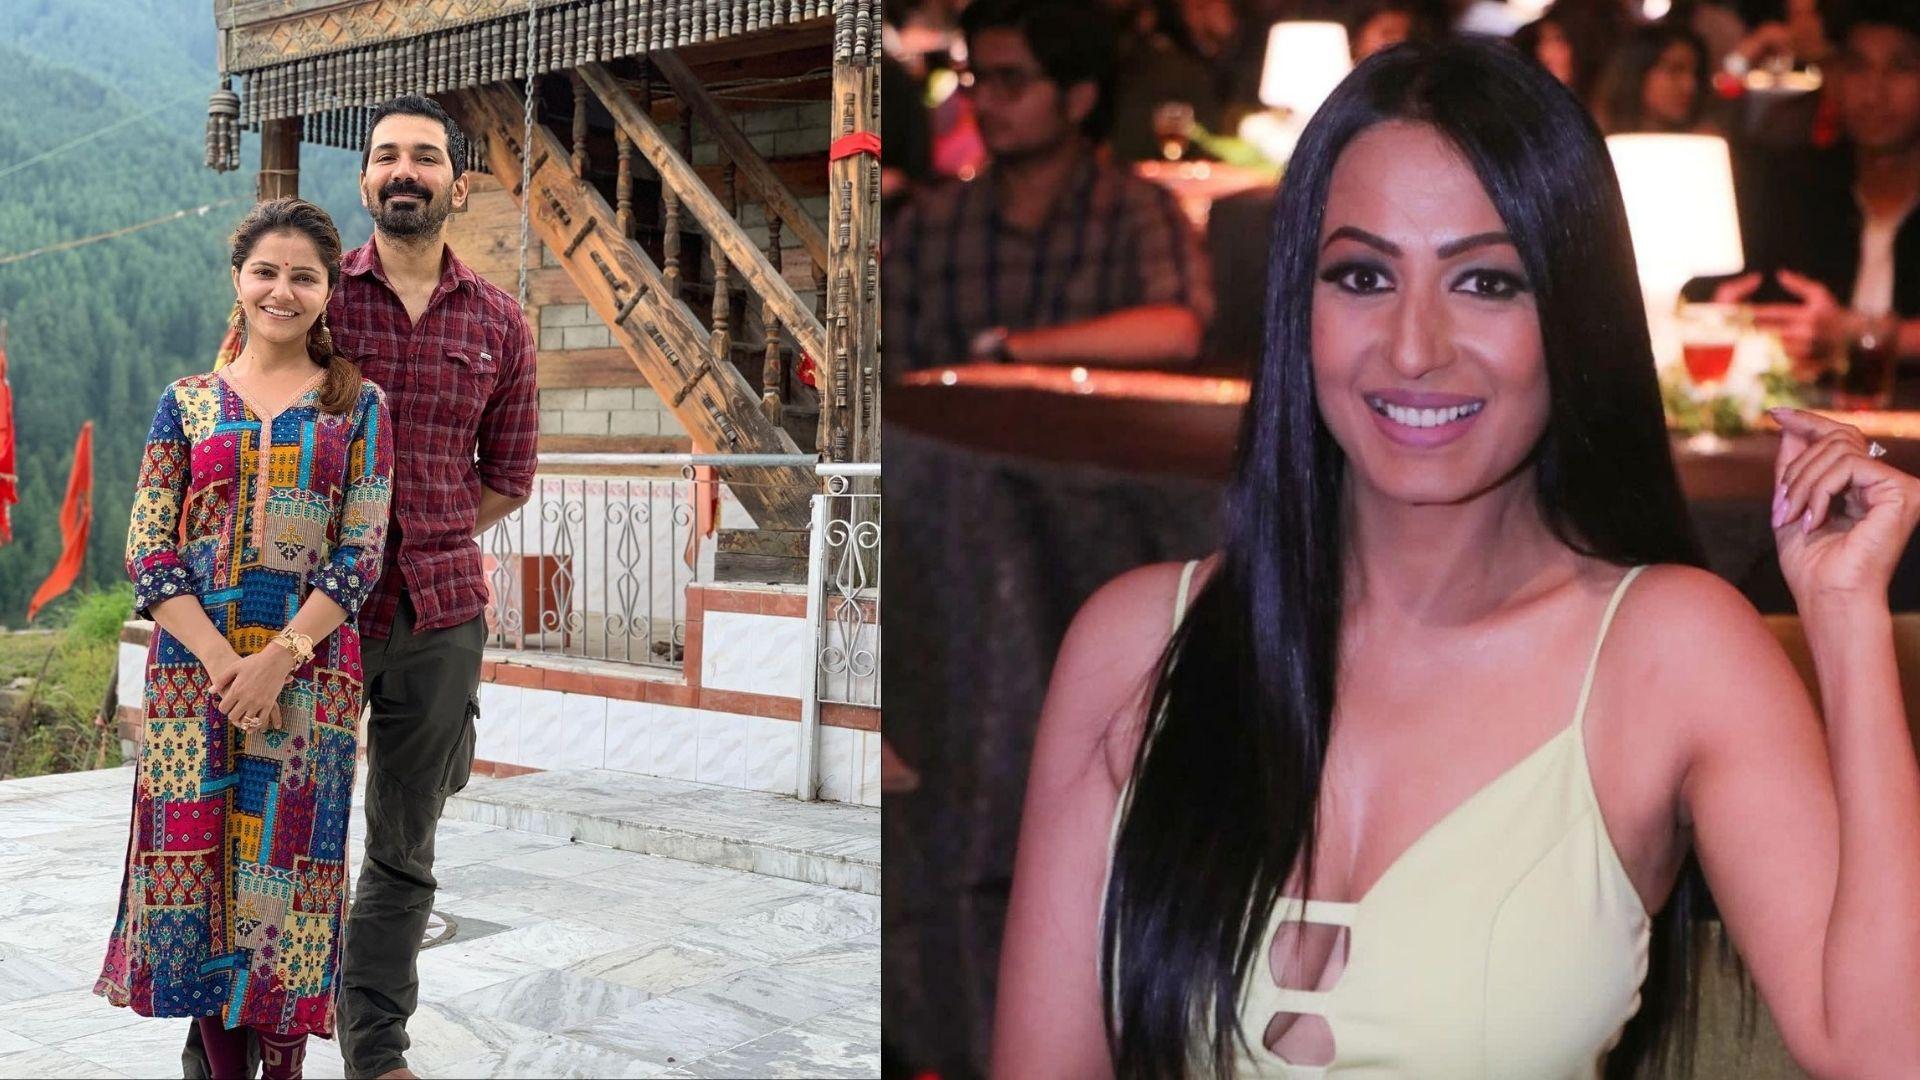 Bigg Boss 15: Kashmera Shah Takes A Dig At Rubina Dilaik And Abhinav Shukla For Eating Apples: Former BB Couple Hits Back With A Savage Replies